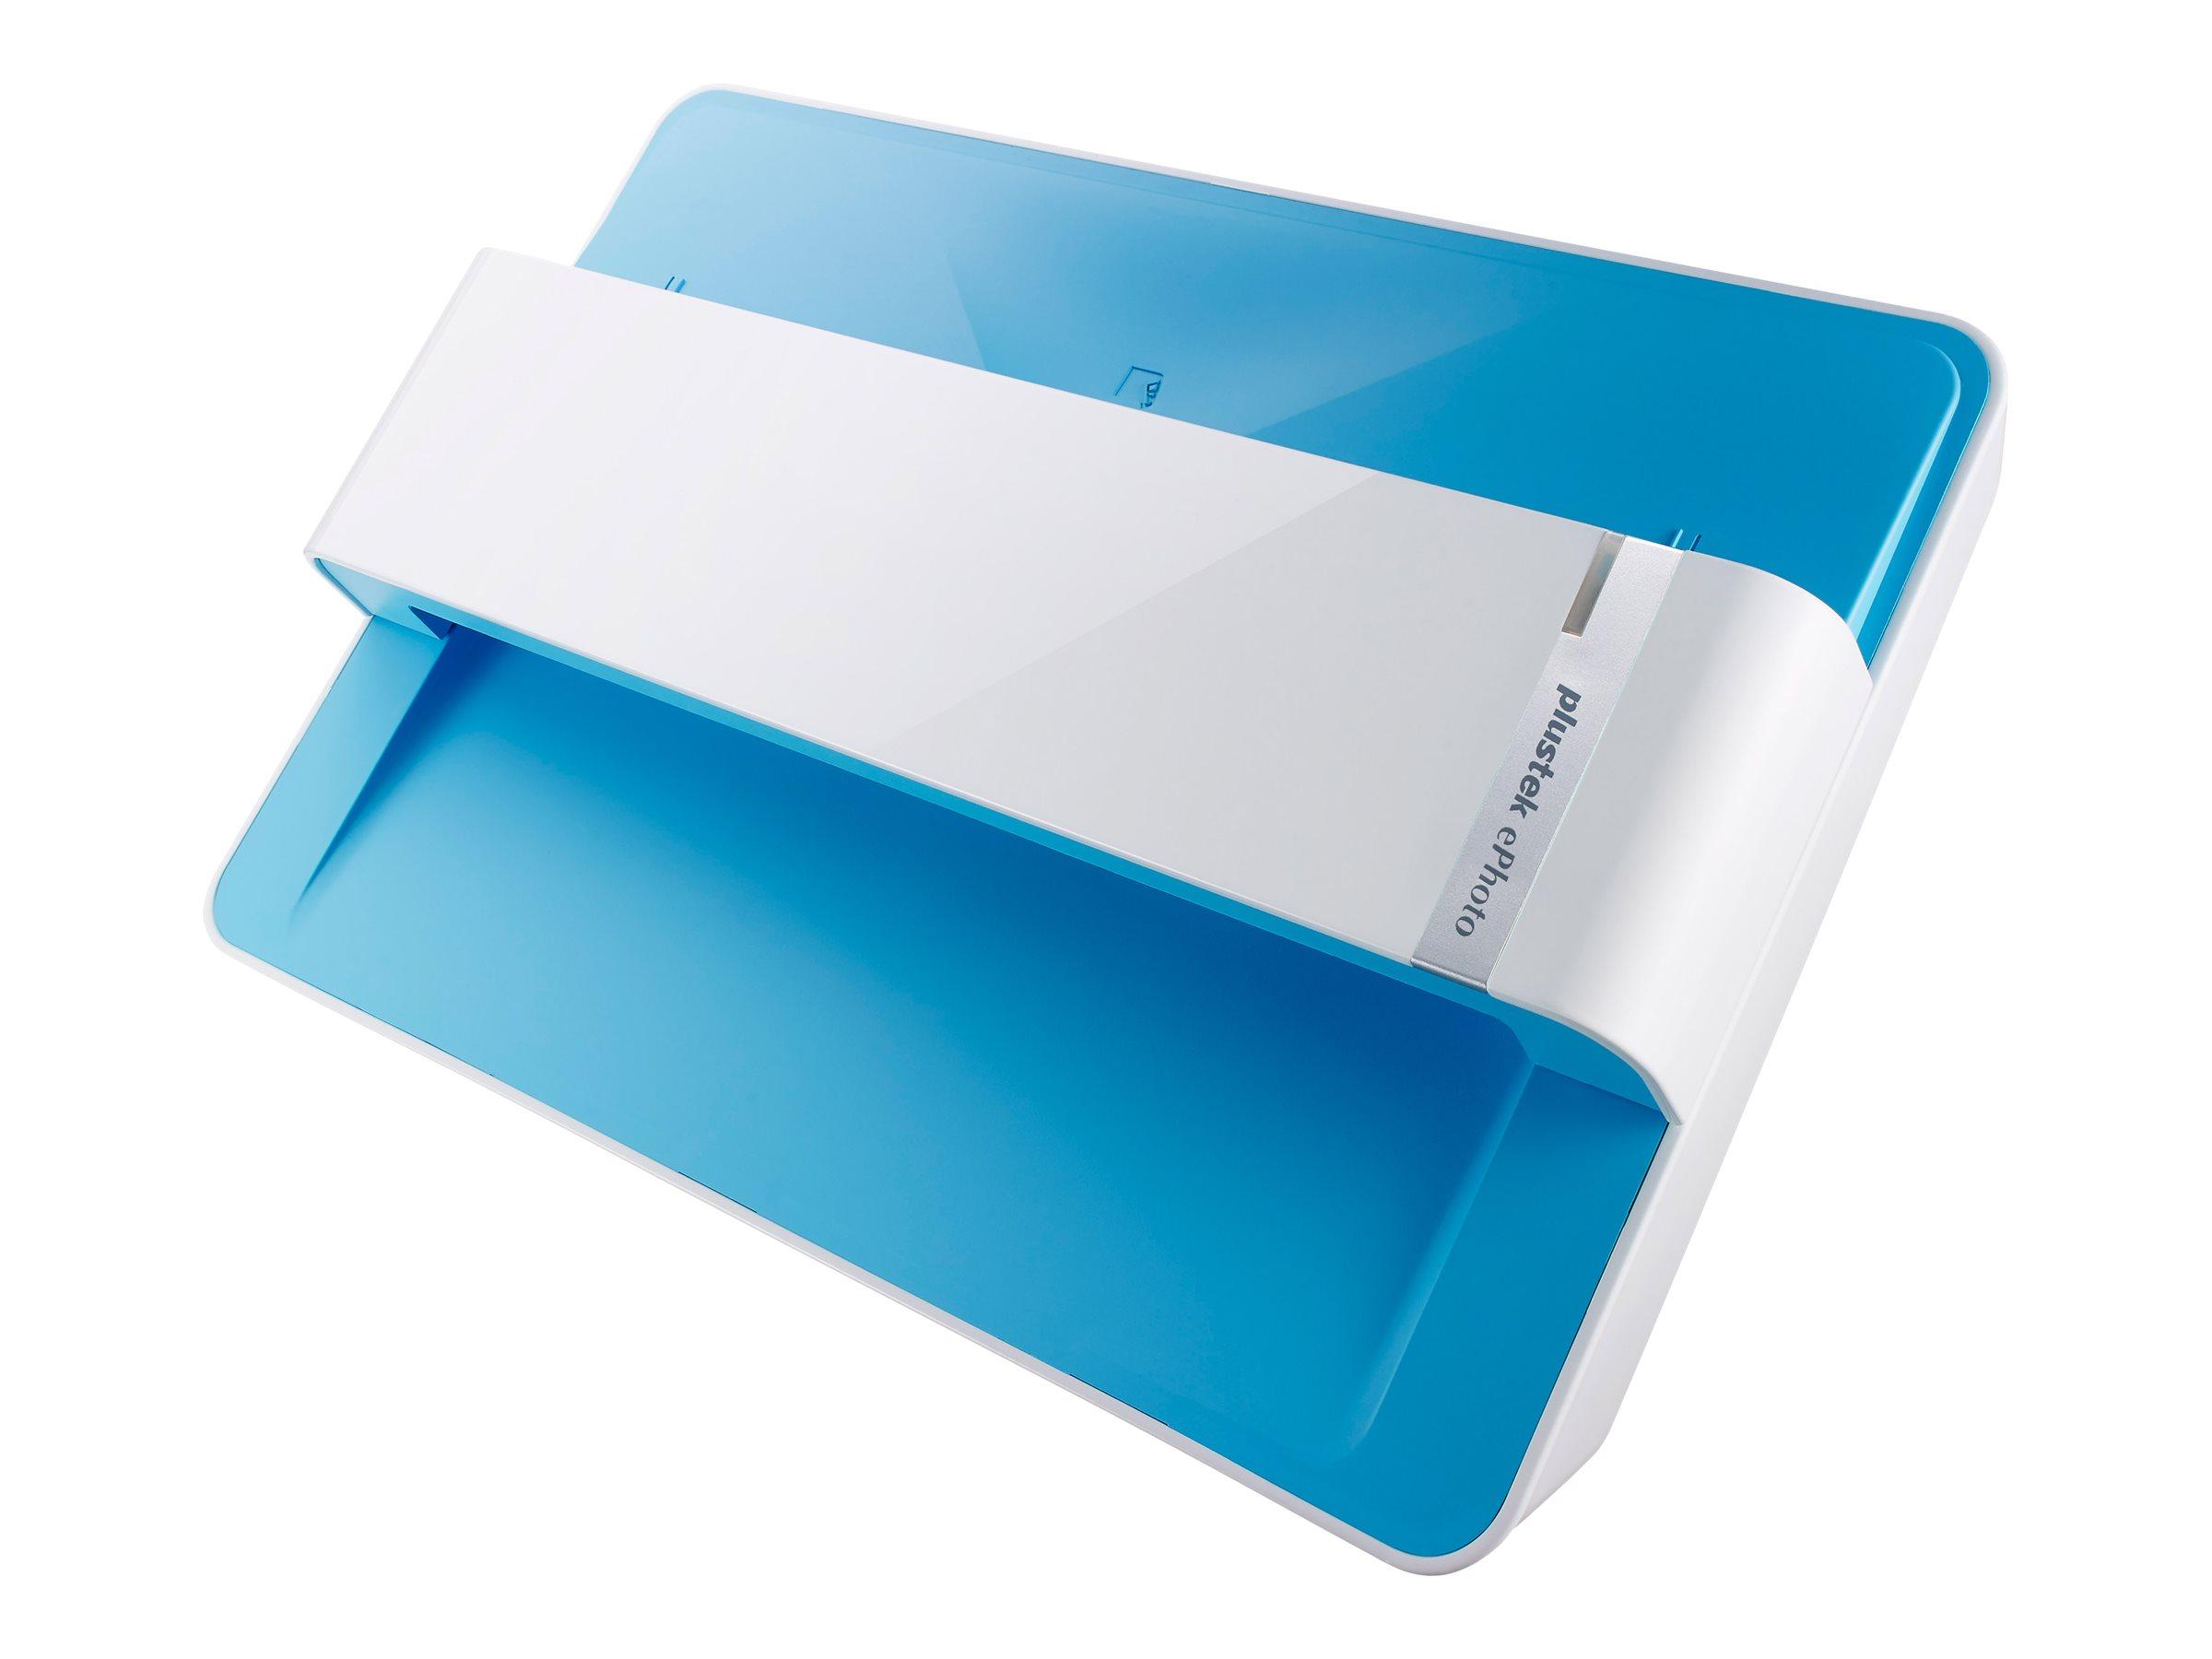 Plustek ePhoto Z300 - Einzelblatt-Scanner - A4/Letter - 300 dpi x 300 dpi - bis zu 500 Scanvorgänge/Tag - USB 2.0